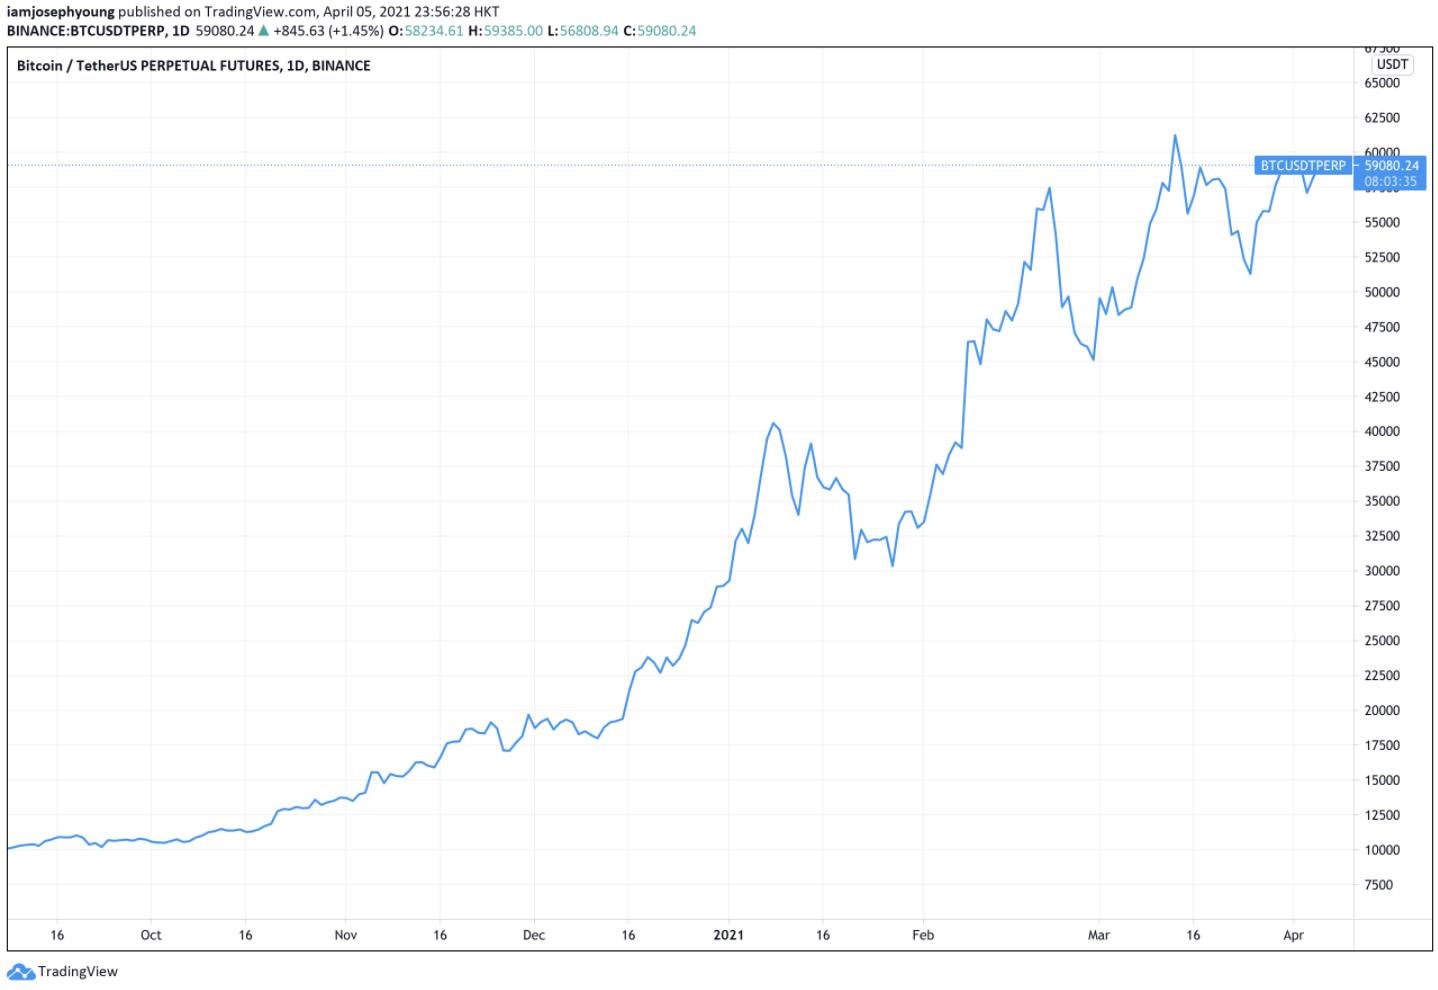 BTC/USD Futures I Cryptofalka